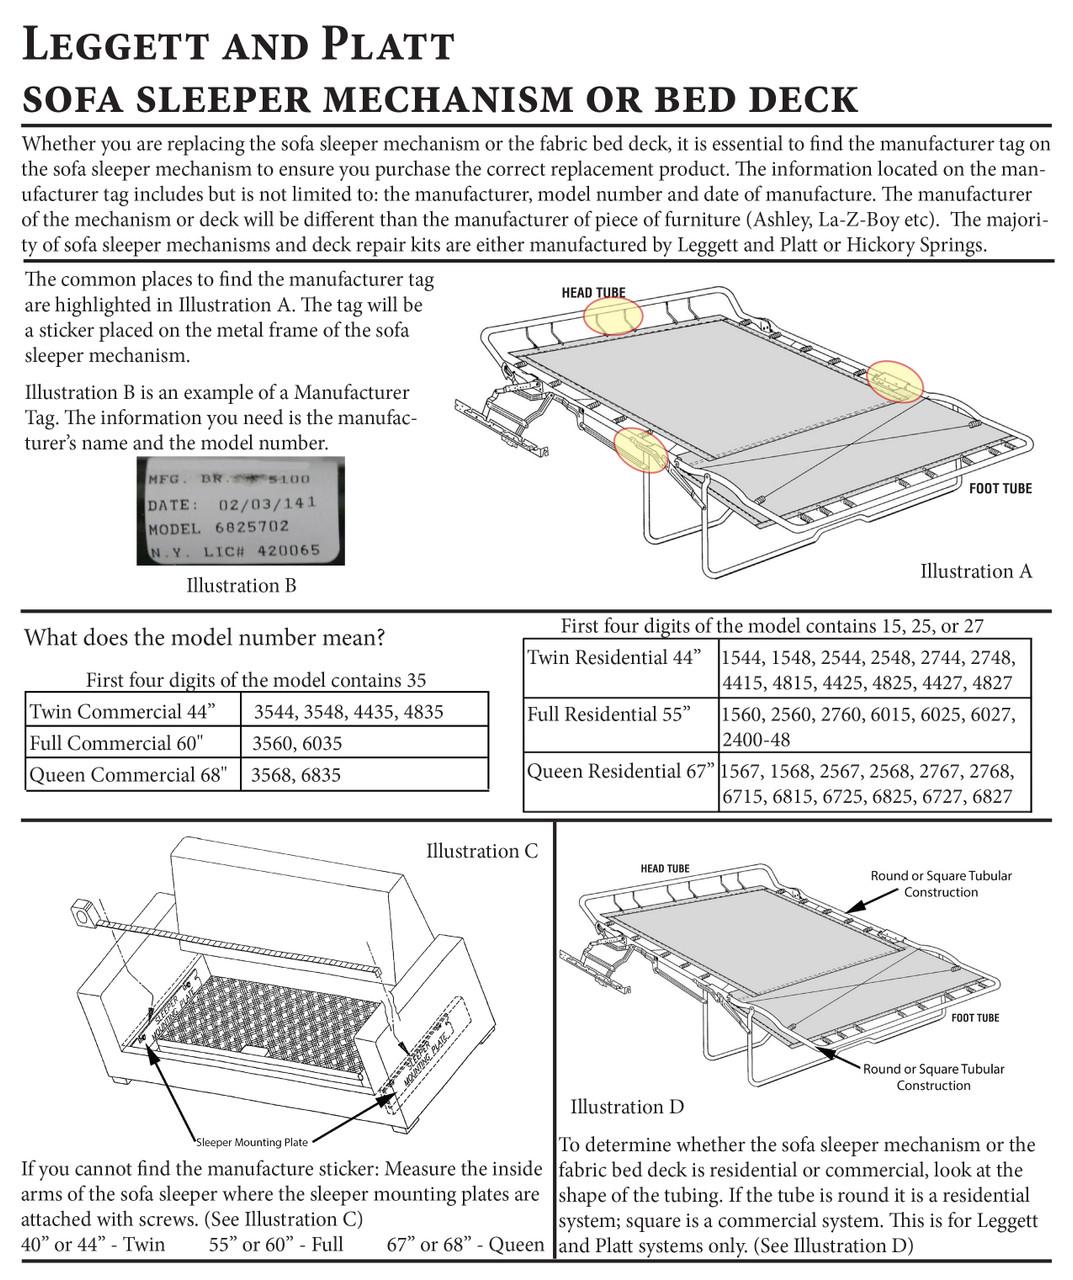 Prime Sofa Sleeper Bed Deck Repair Kit Queen Residential Machost Co Dining Chair Design Ideas Machostcouk